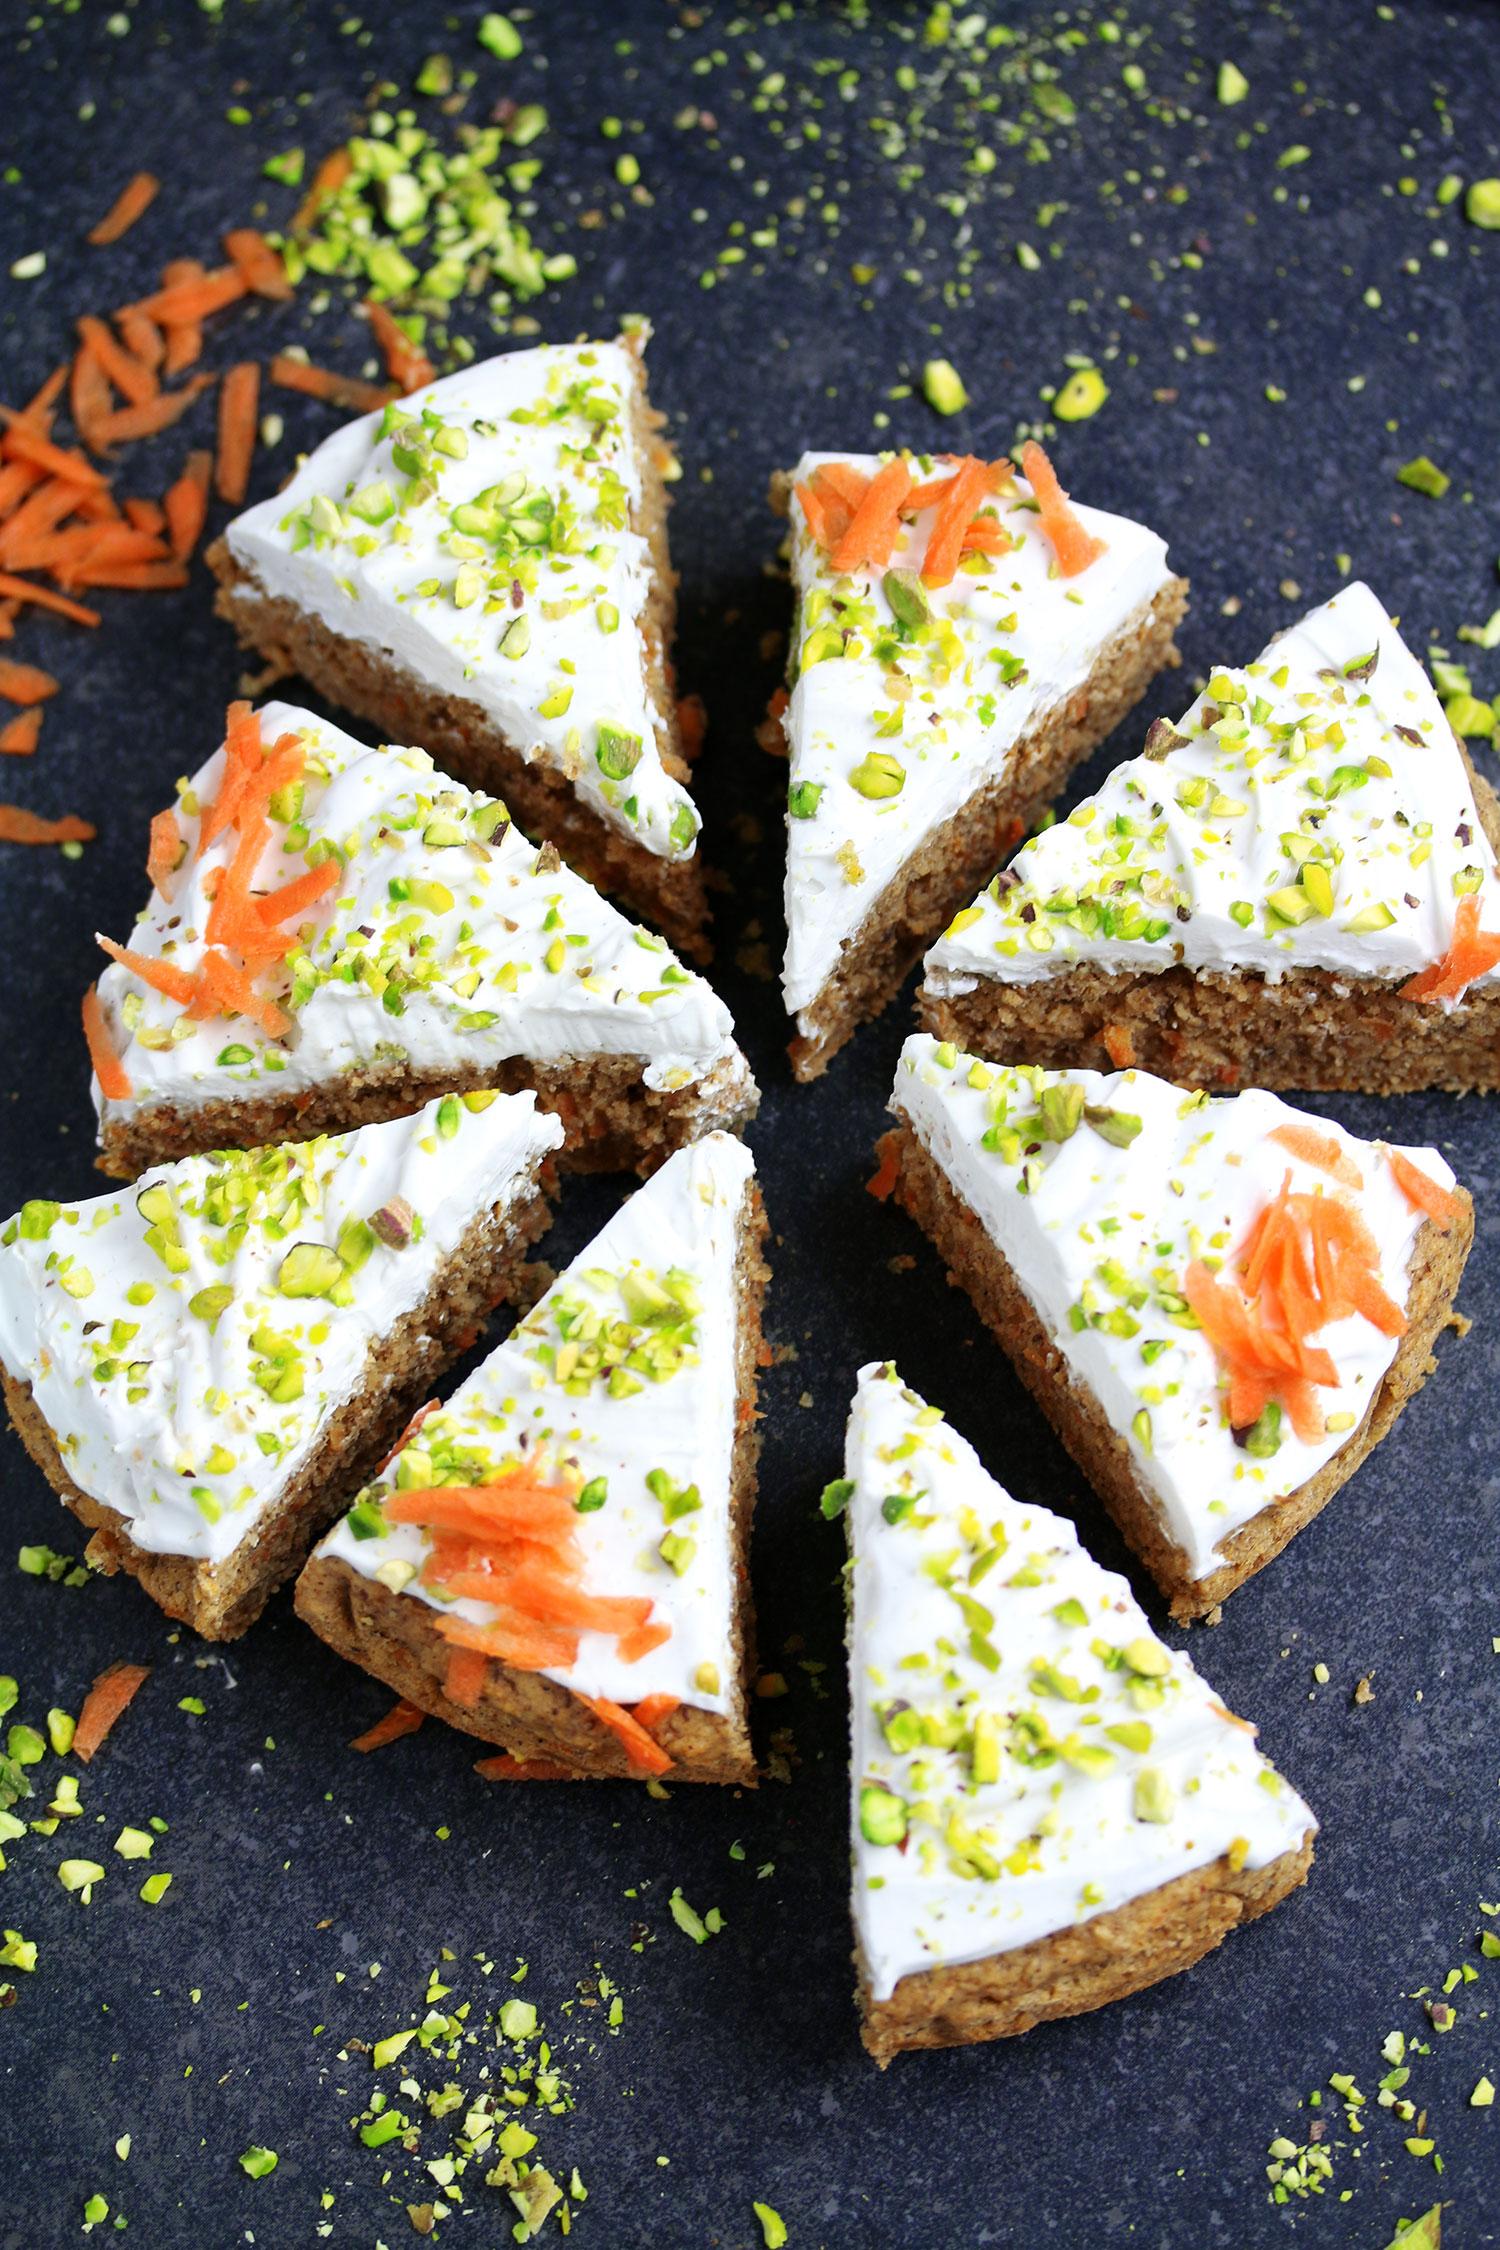 Vegan Gluten Free Carrot Cake Uk Health Blog Nadia S Healthy Kitchen